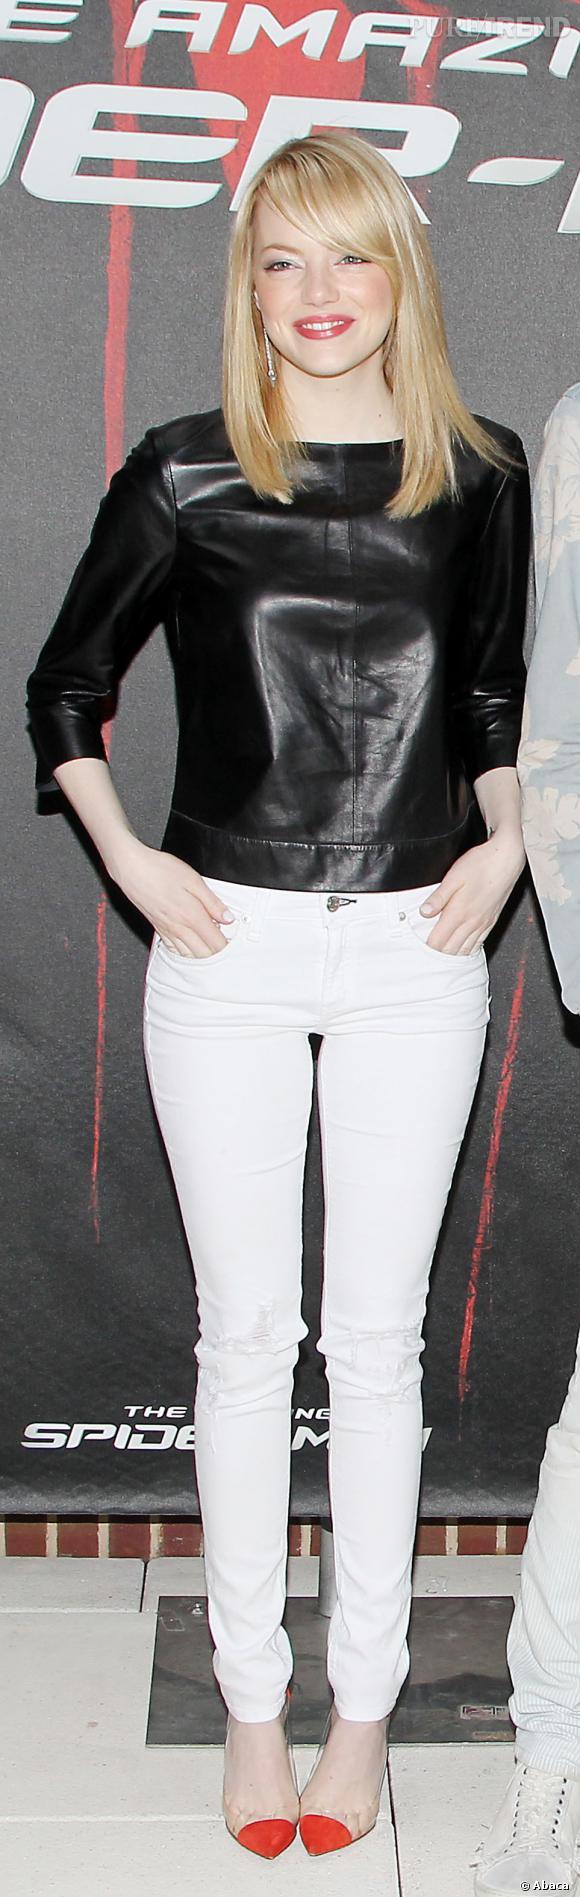 "Emma Stone au photocall du film ""The Amazing Spider-Man"" le 9 juin à New-York."